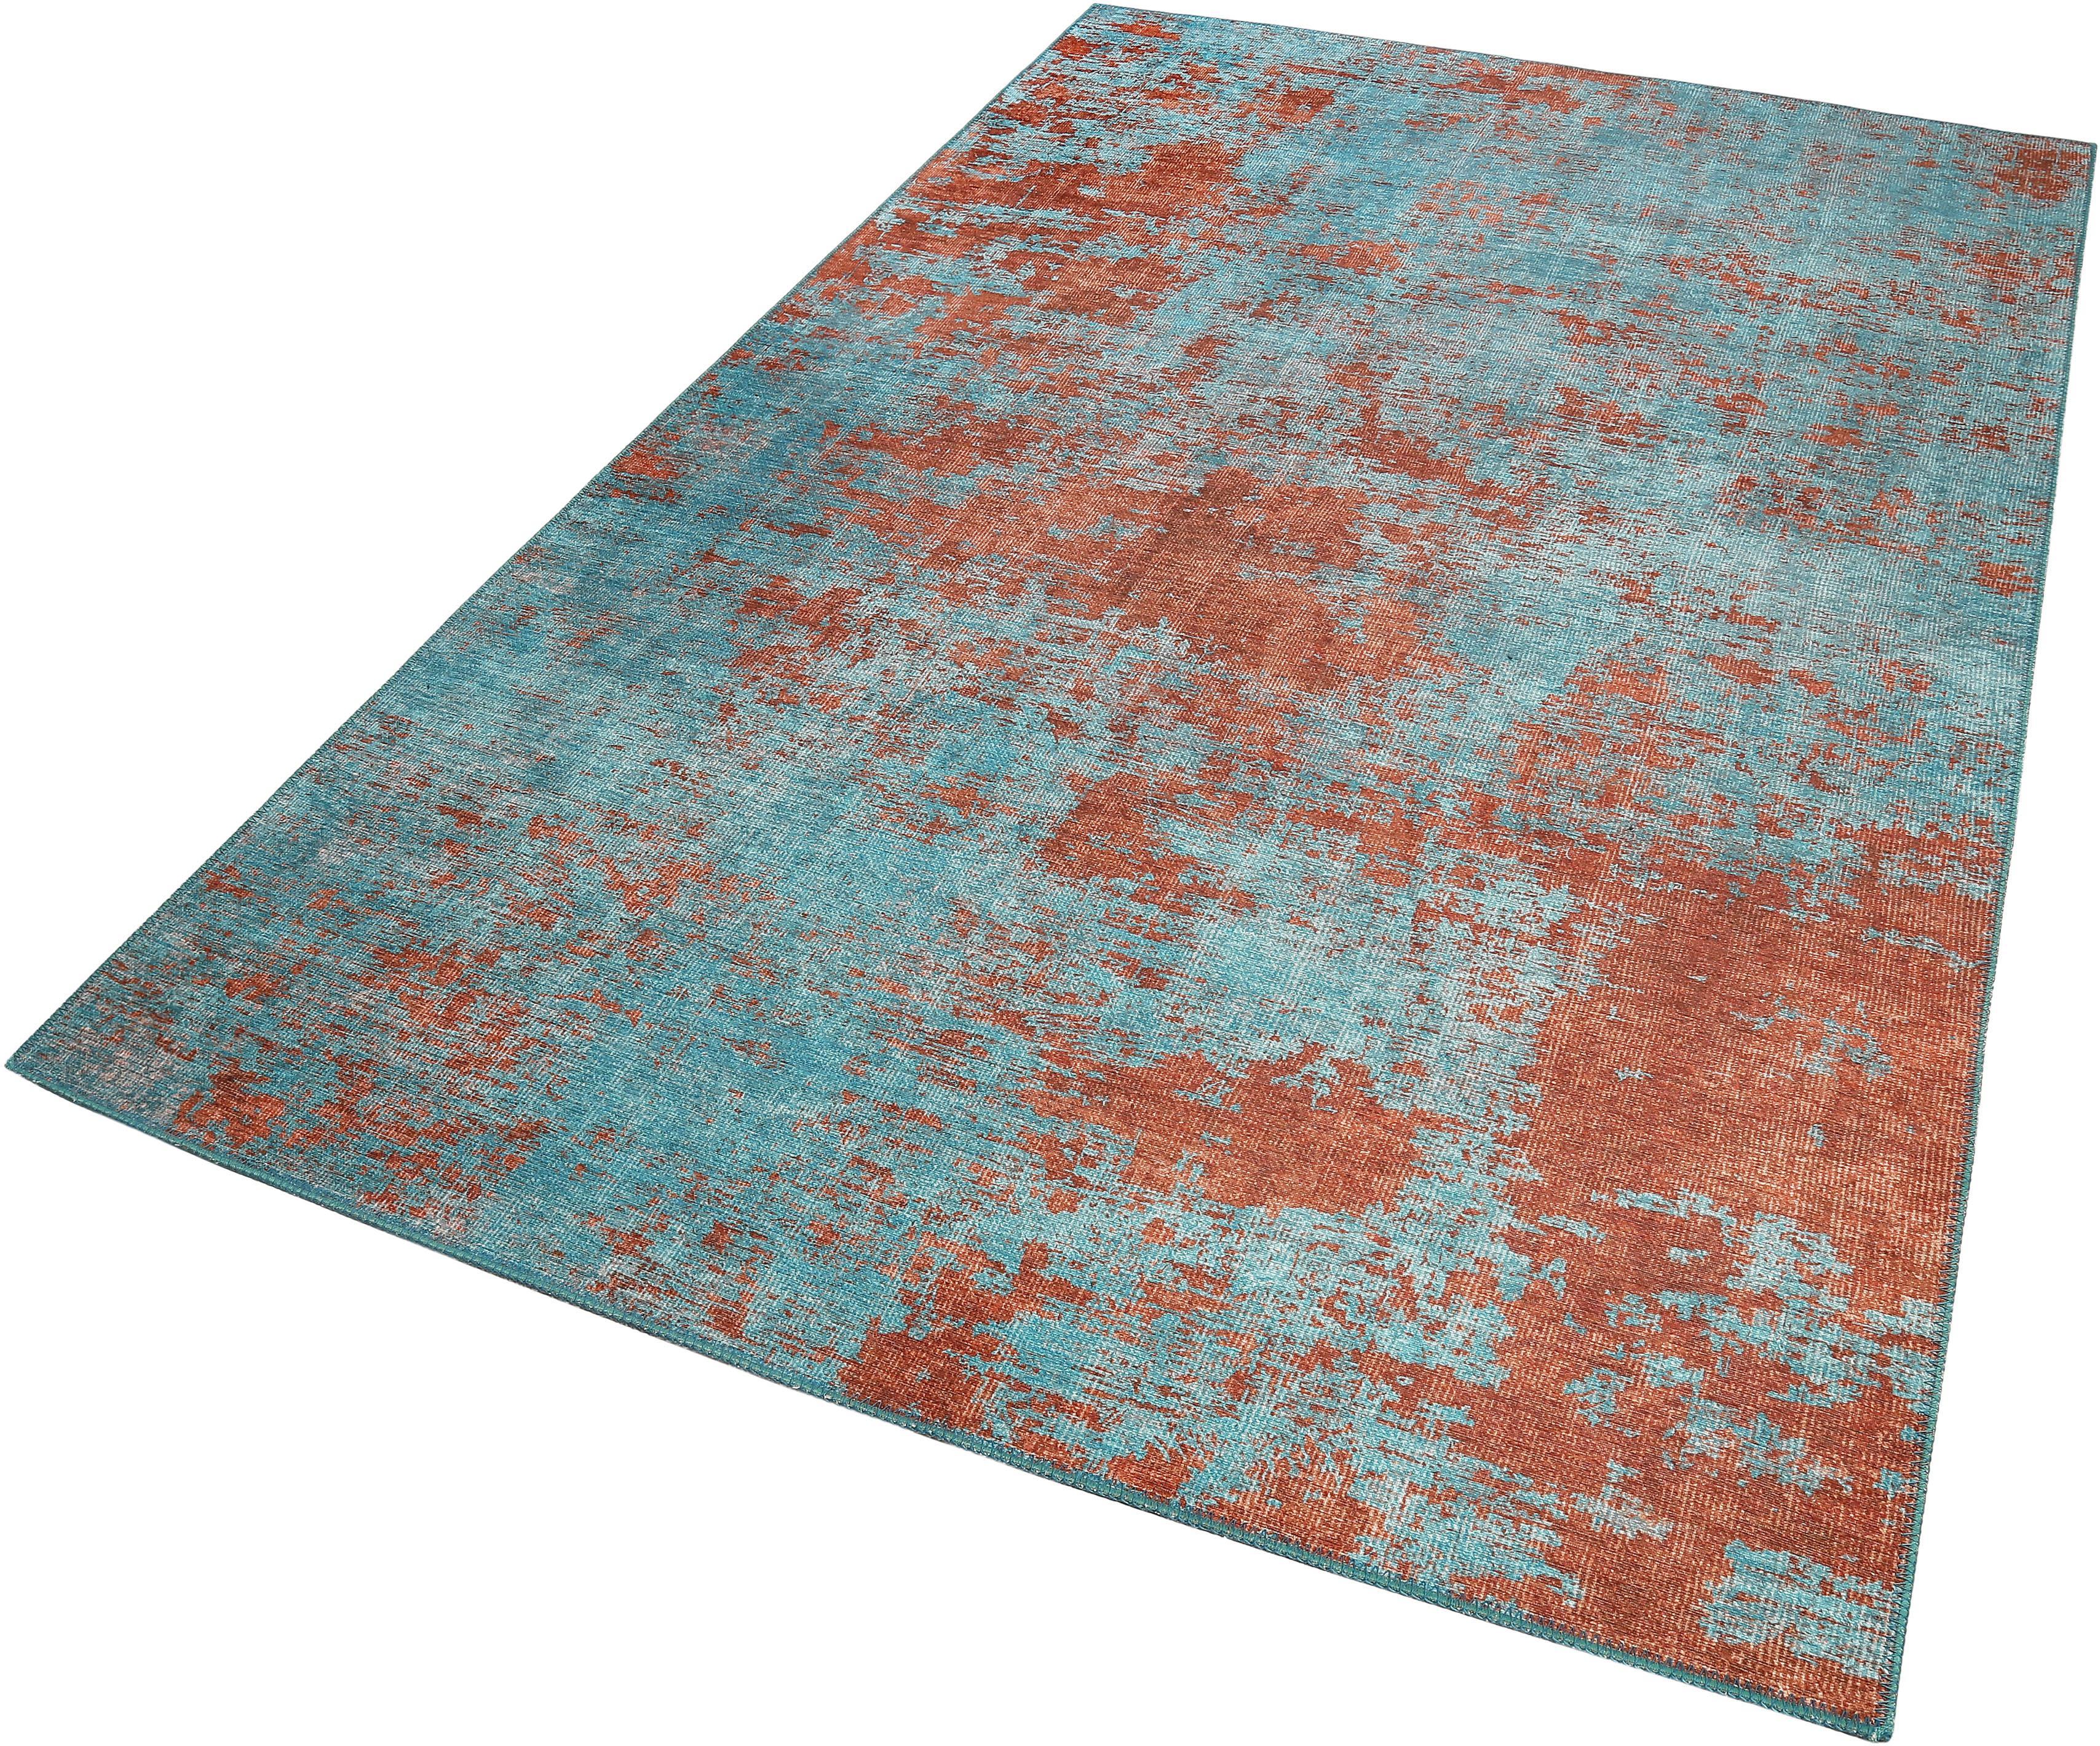 Teppich Hot Spring Wecon Home rechteckig Höhe 6 mm maschinell gewebt